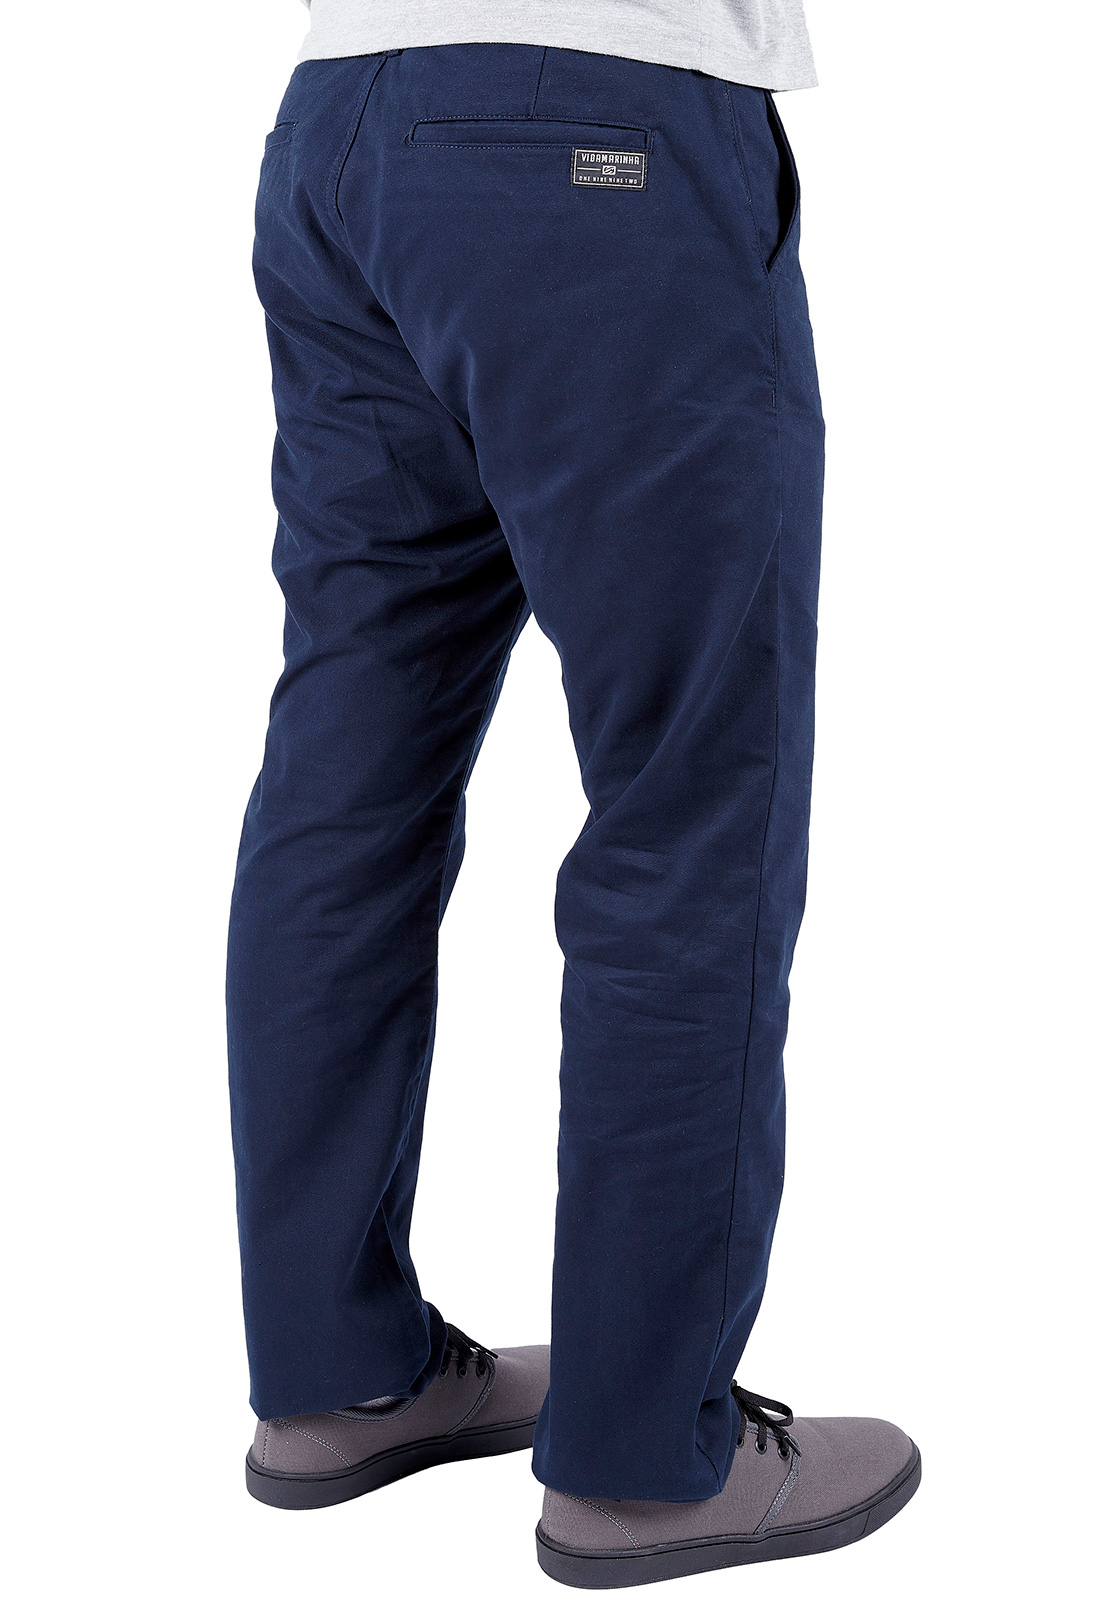 Calça de Sarja Vida Marinha Slim Azul Marinho